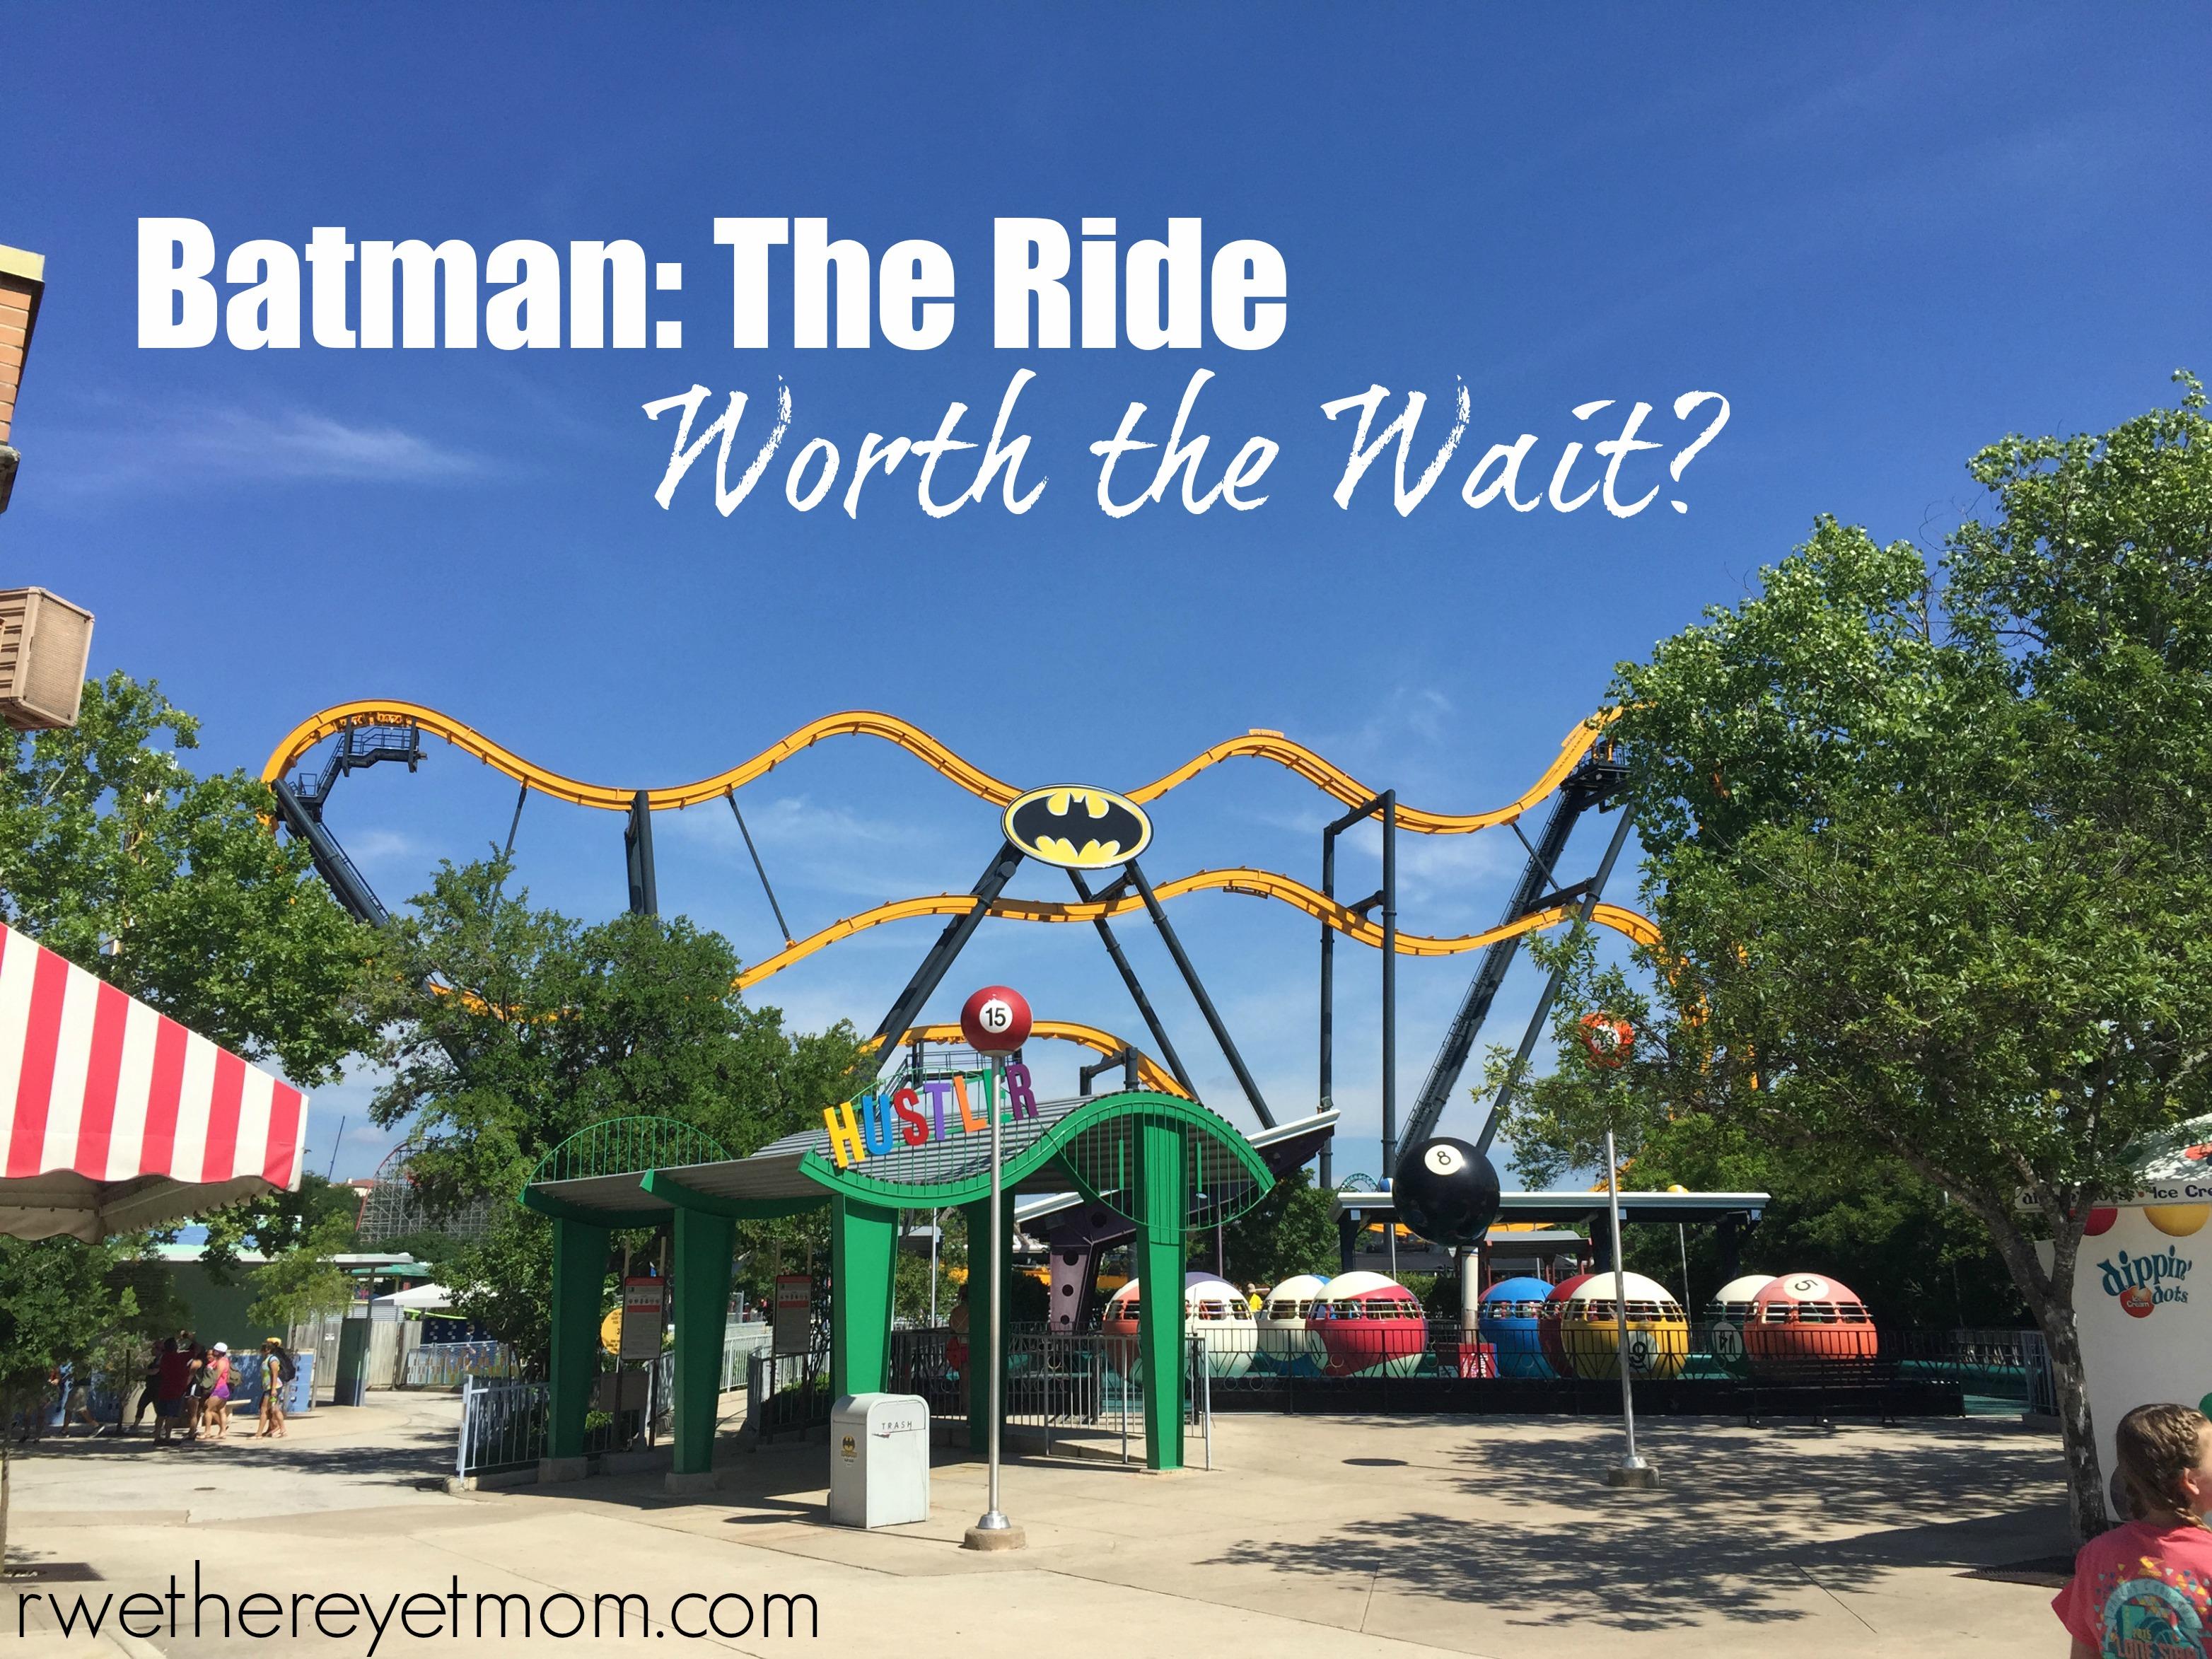 Batman The Ride At Six Flags Fiesta Texas Worth The Wait